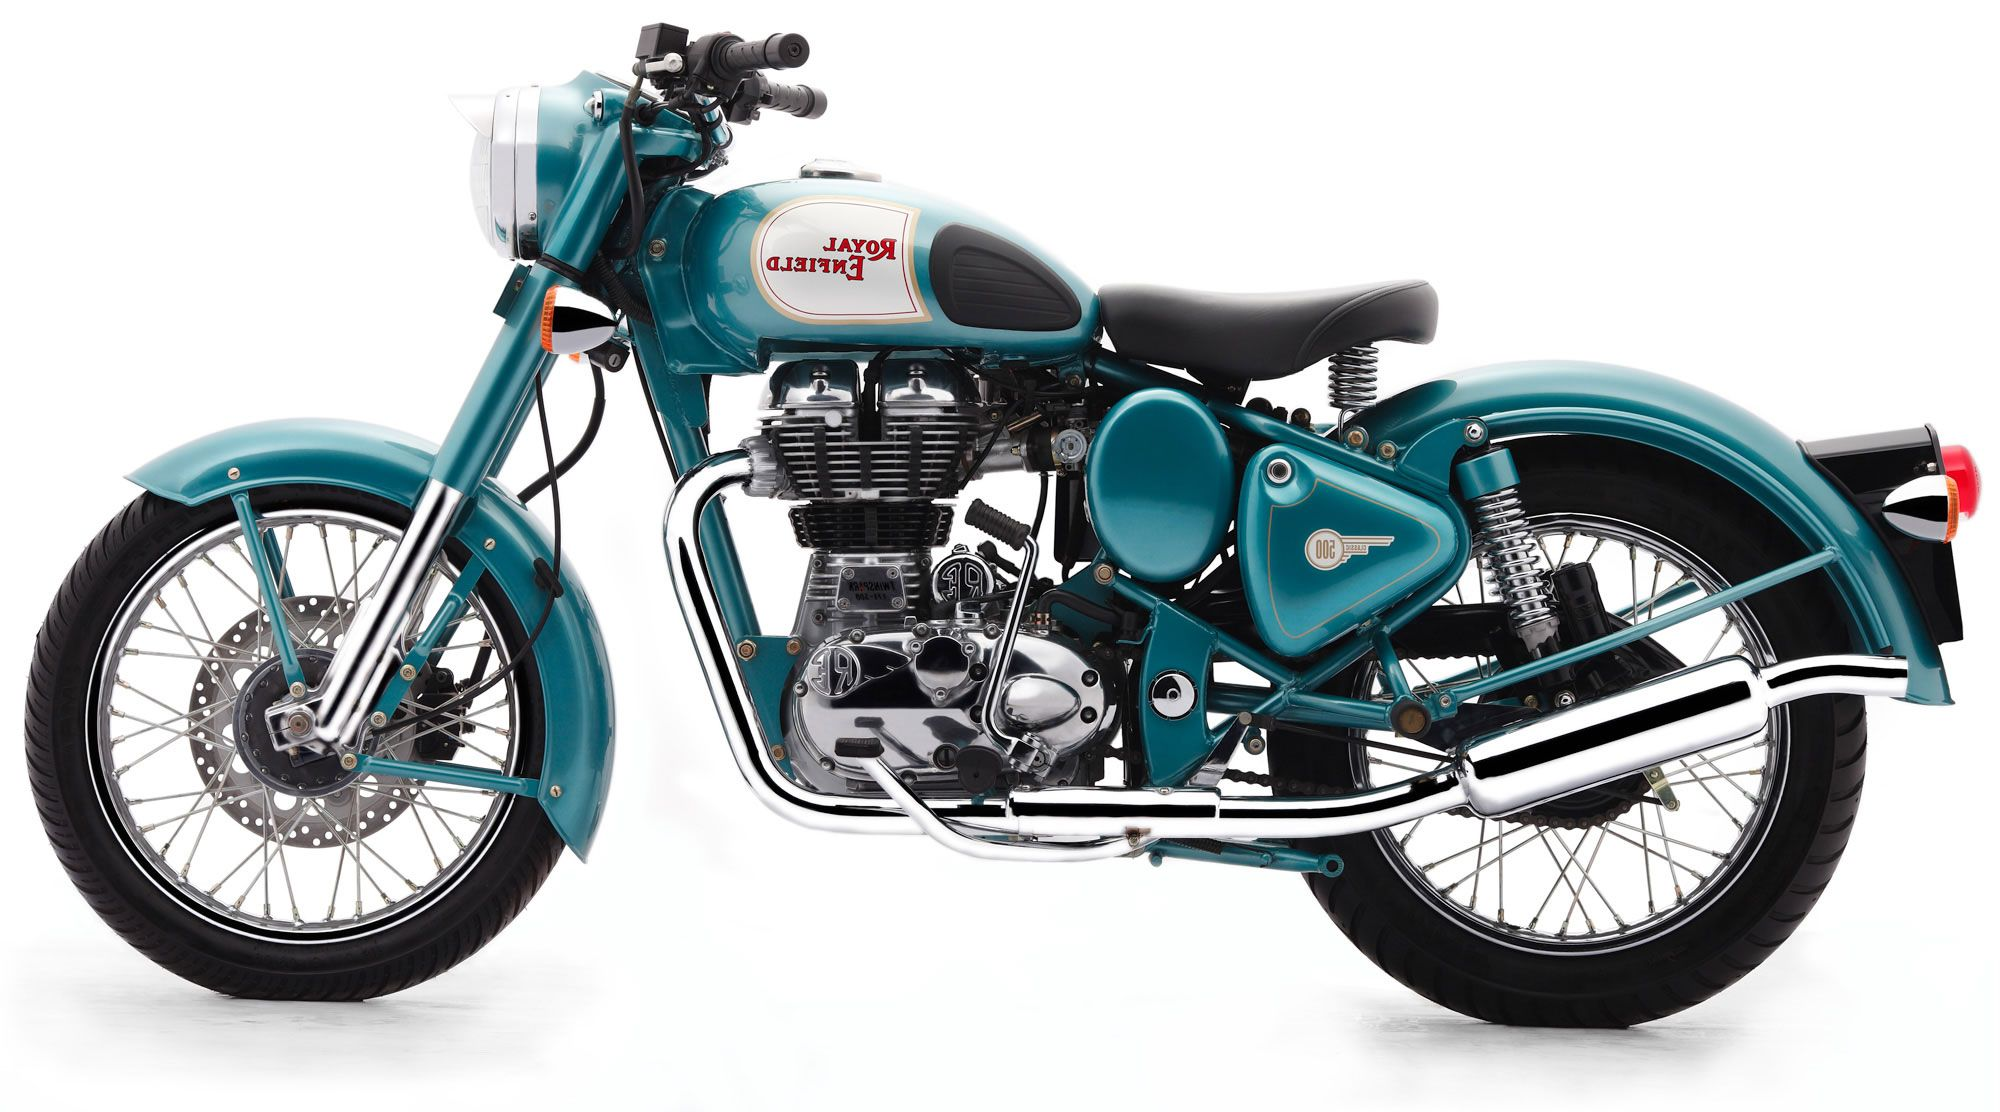 Royal Enfield Bullet Bike Hd Wallpapers Hd Wallpapers